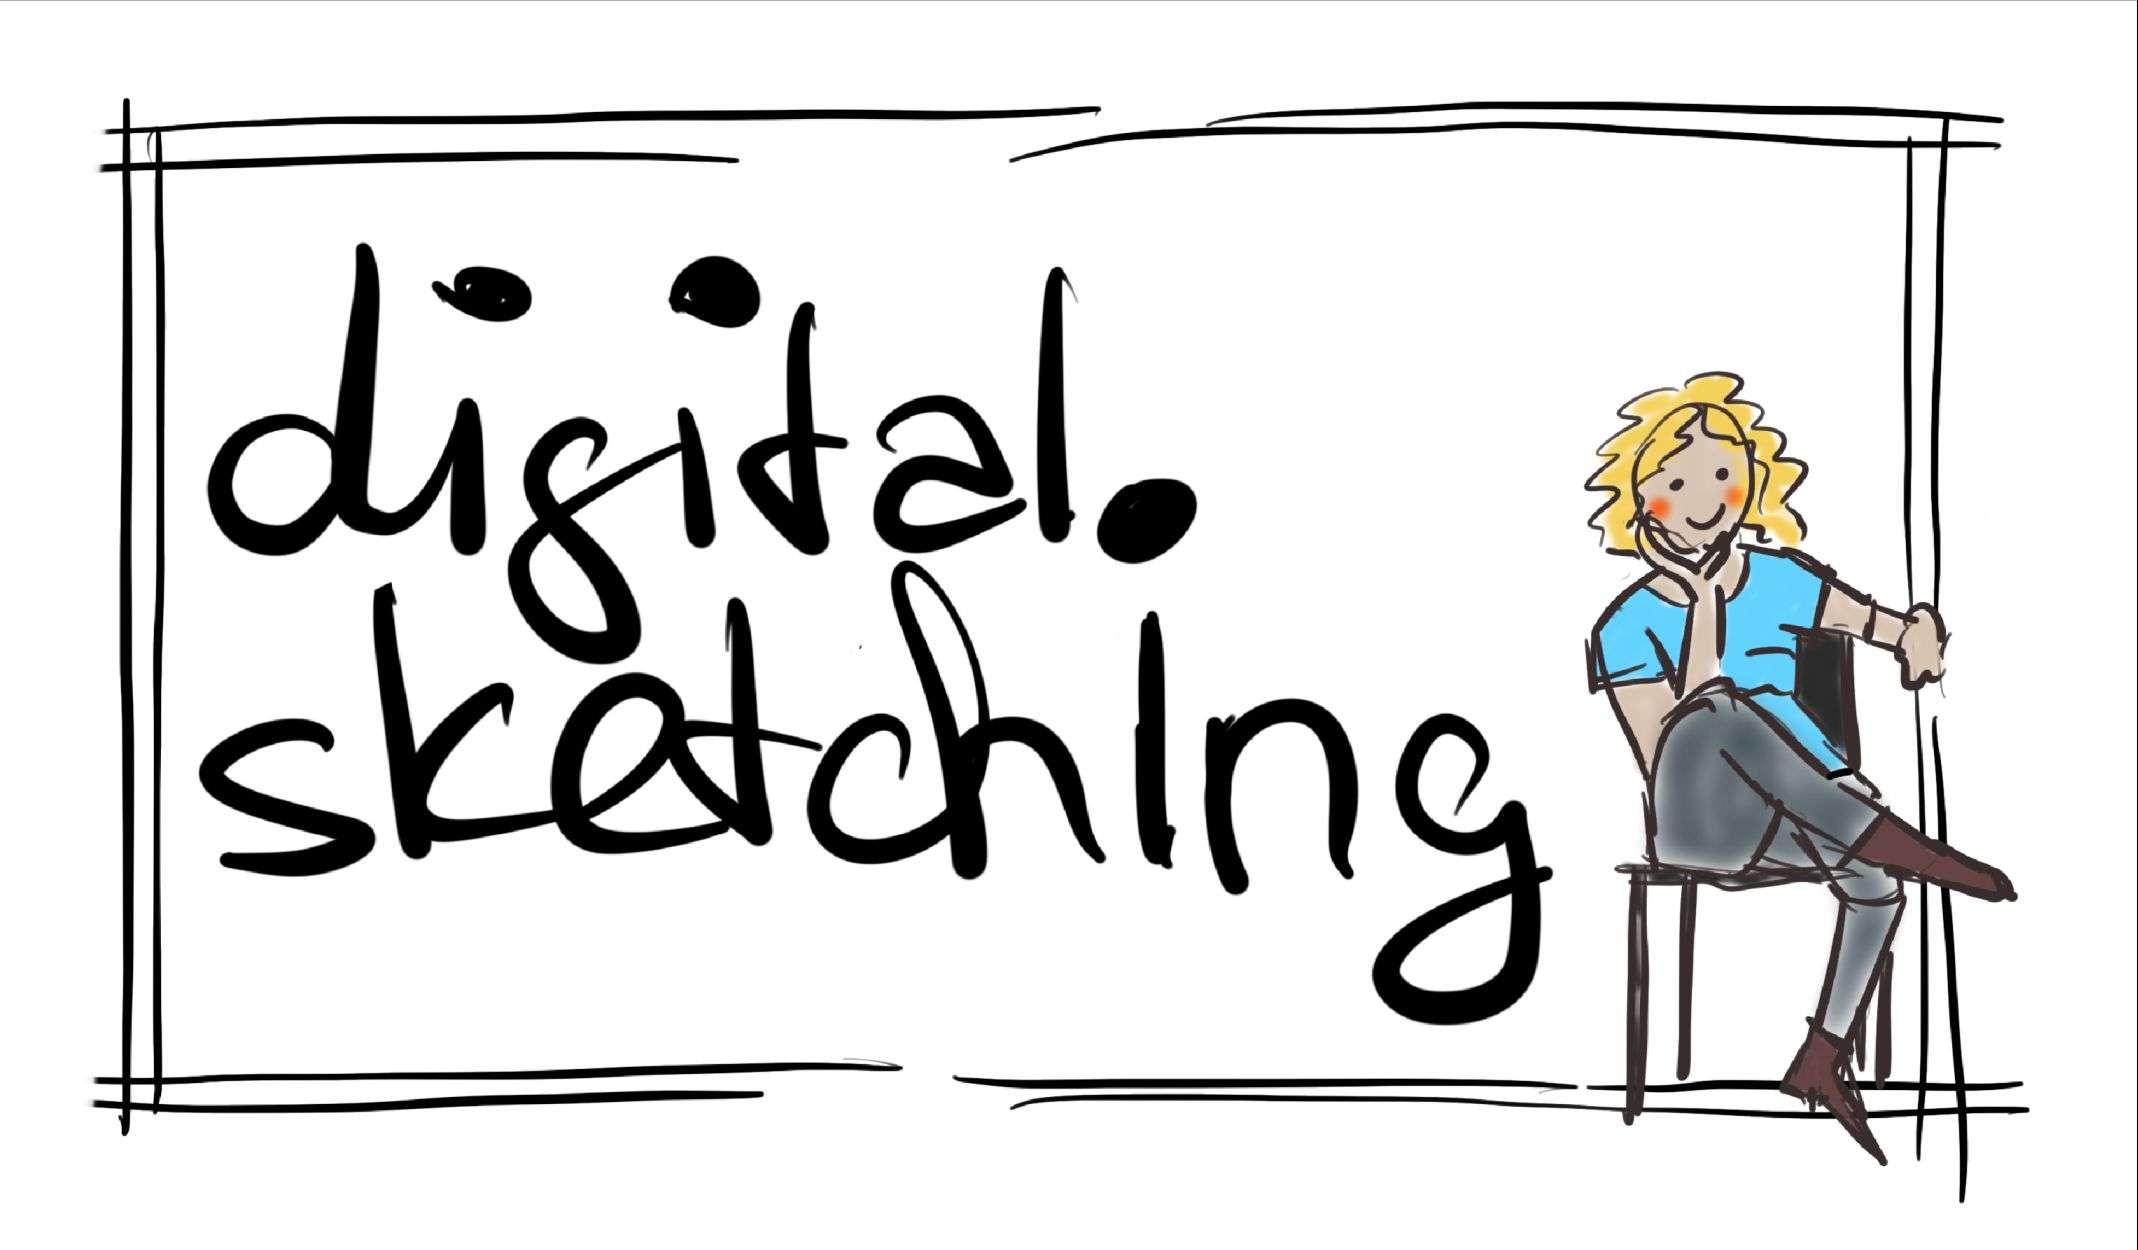 digitalsketching